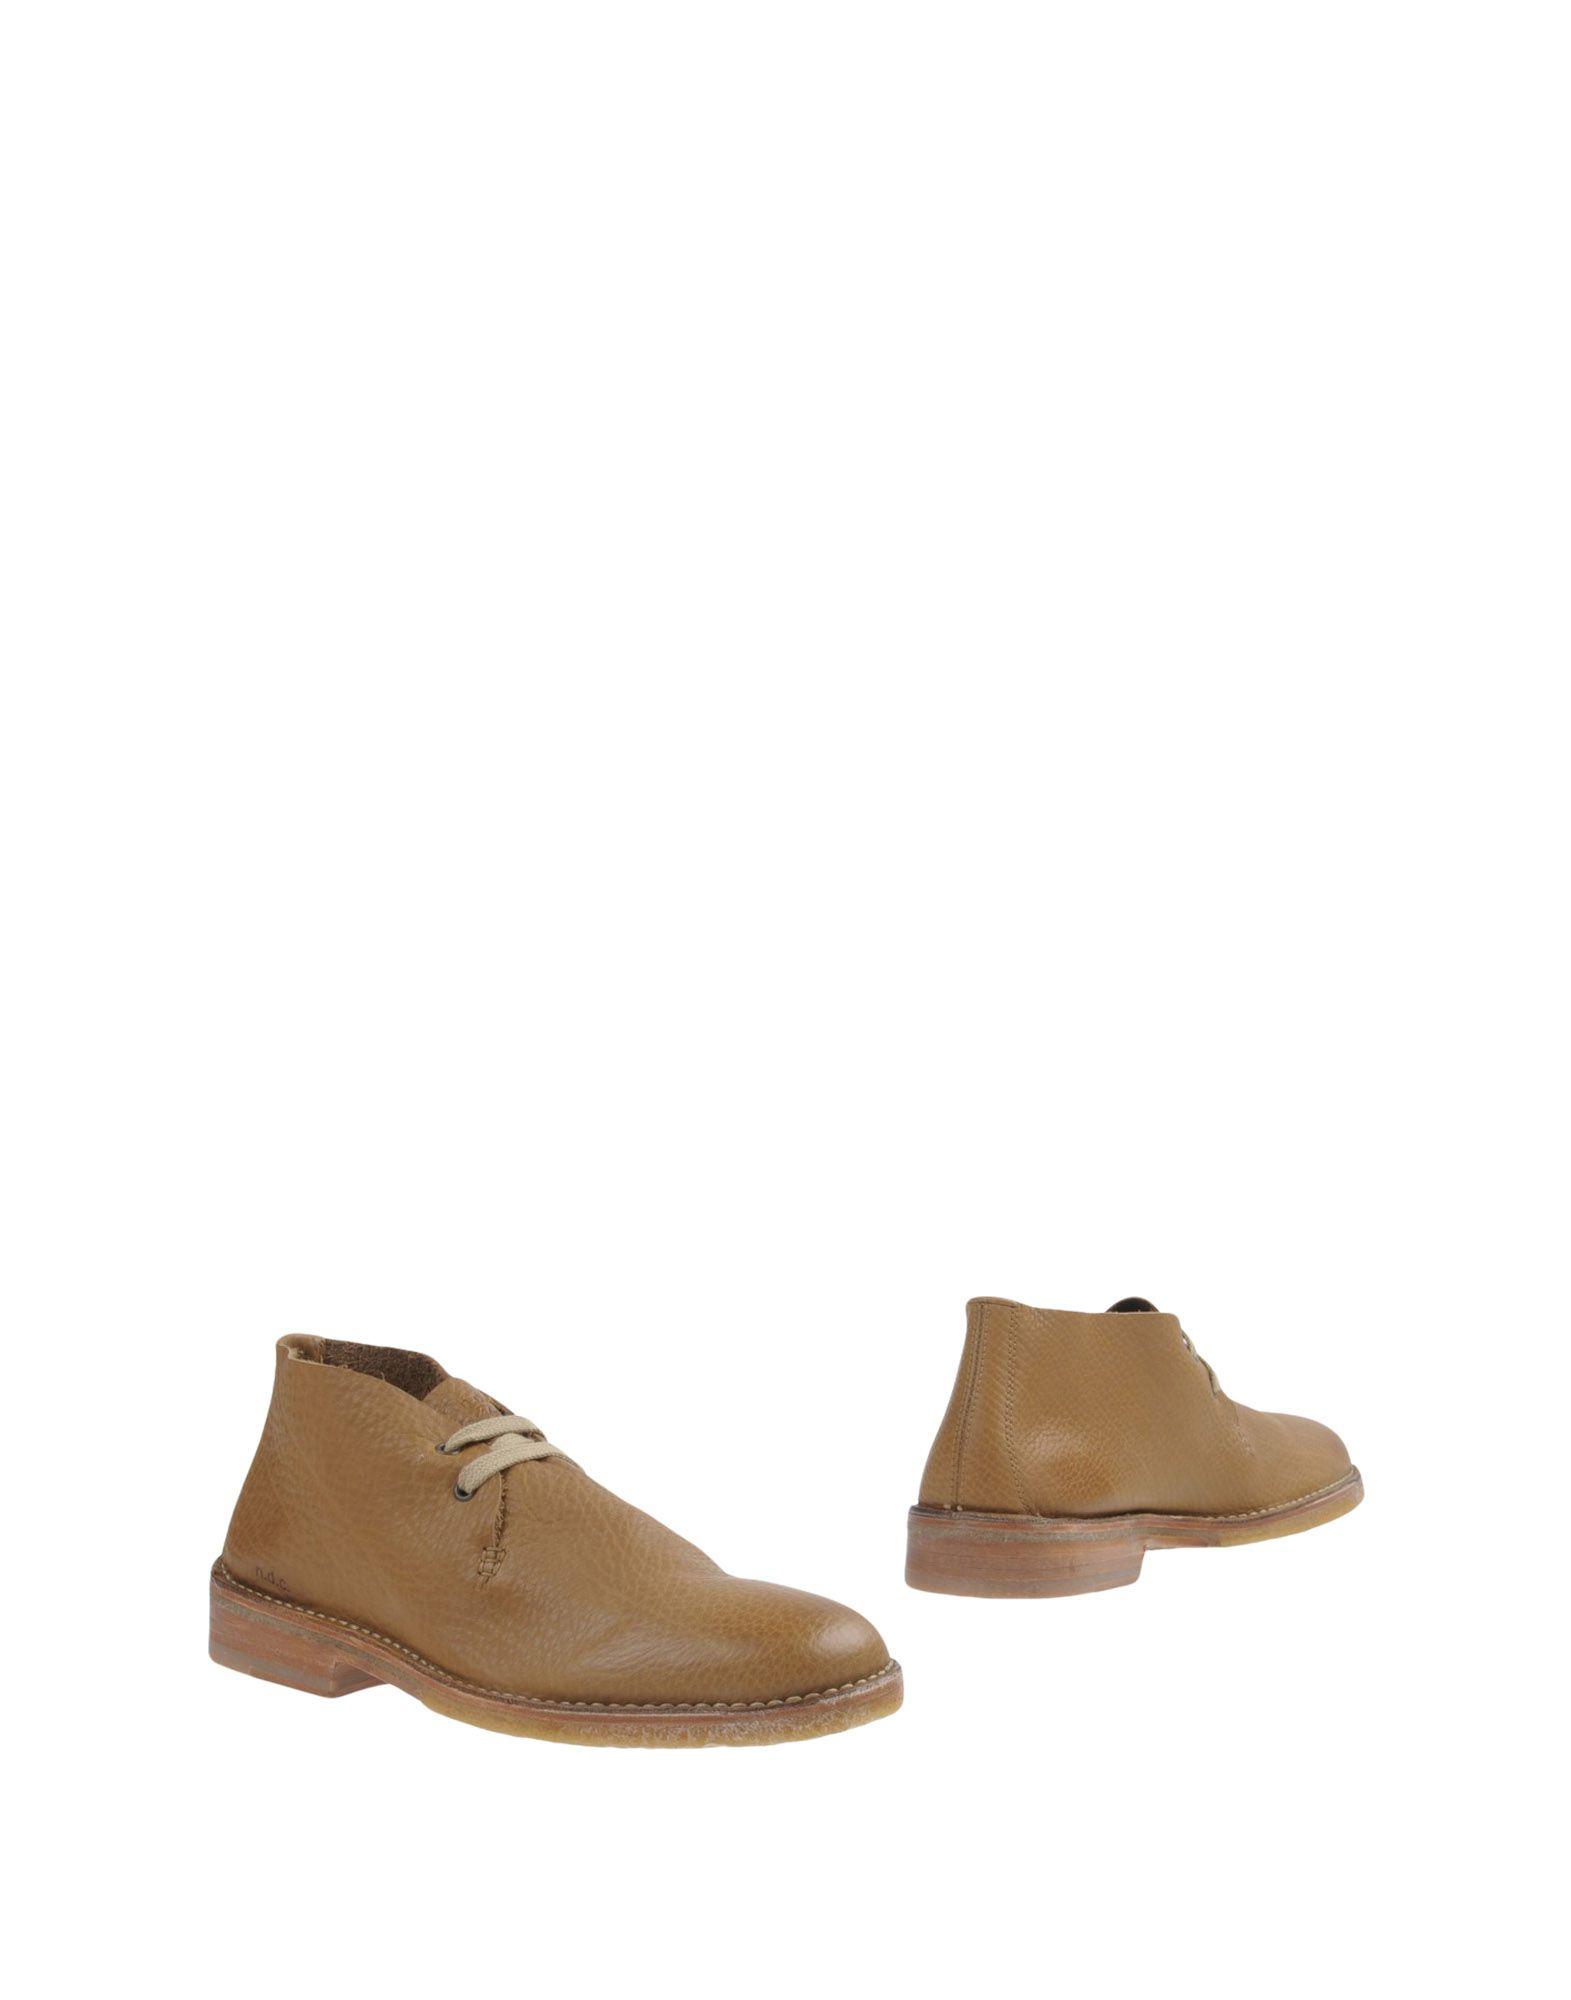 Rabatt echte Schuhe N.D.C. Made By Hand Stiefelette Herren  11225282BO